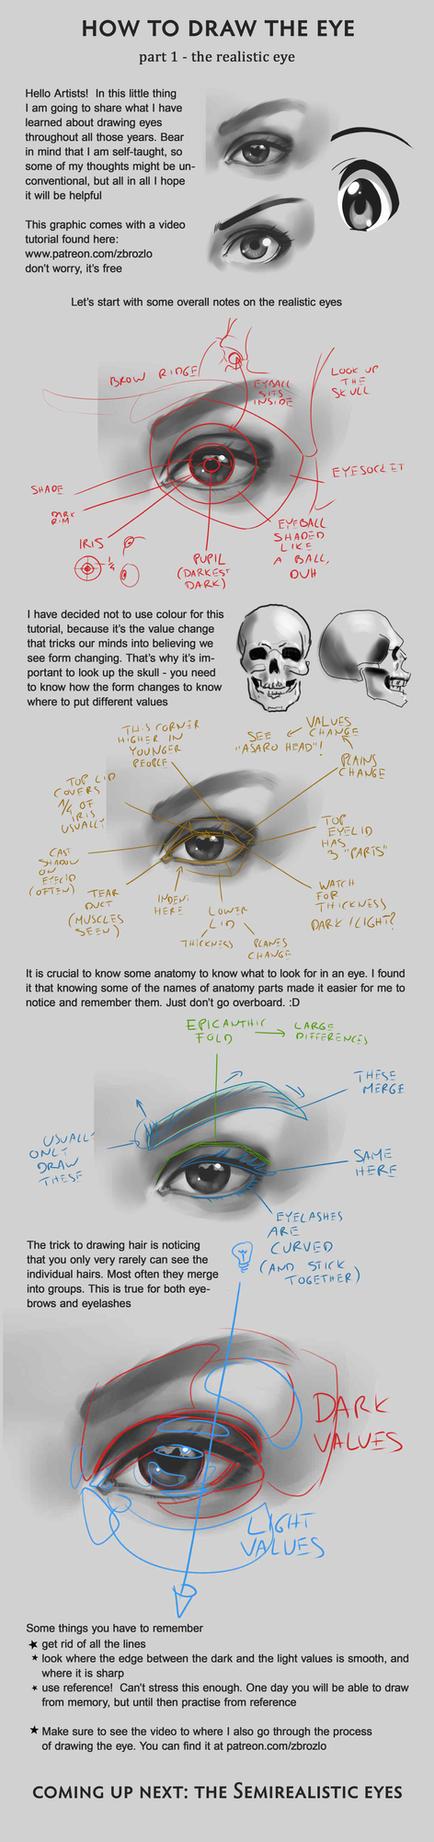 How to draw eyes (realistic) by zaphiel-san